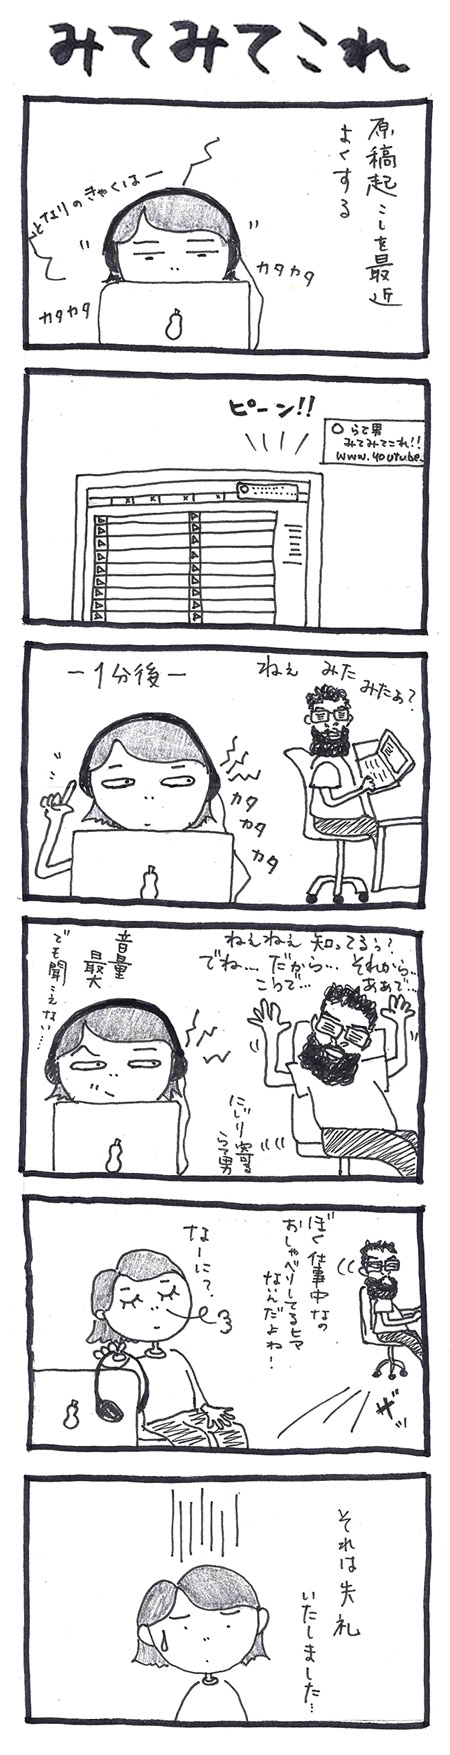 manga_01_mitemite